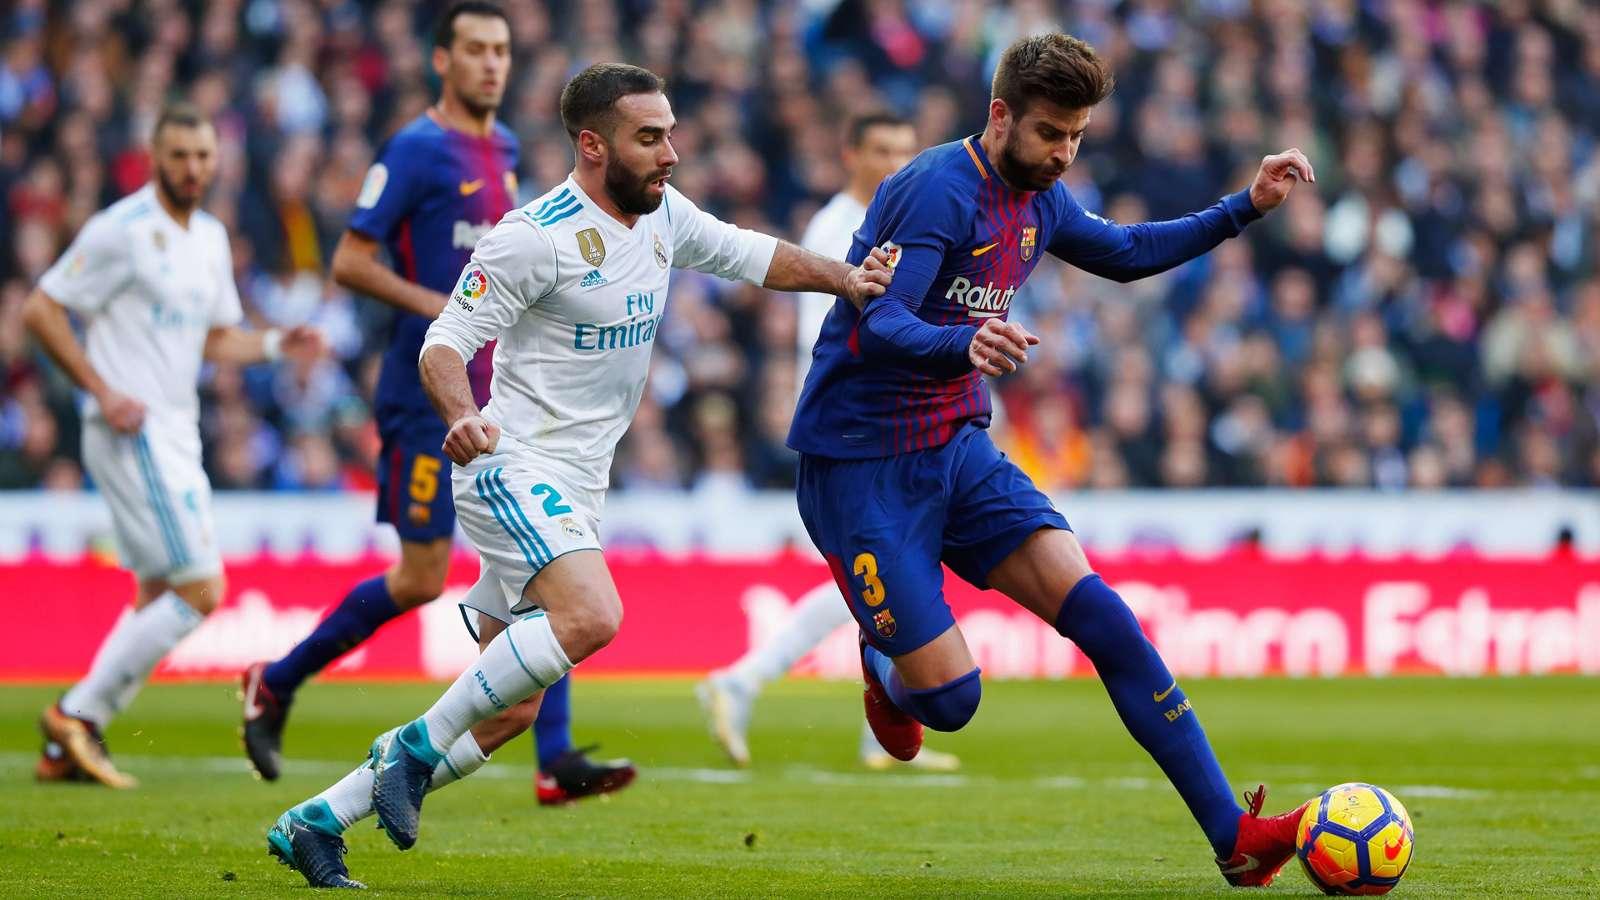 Carvajal: I yearn to play El Clásico and Mbabi deserve Real Madrid